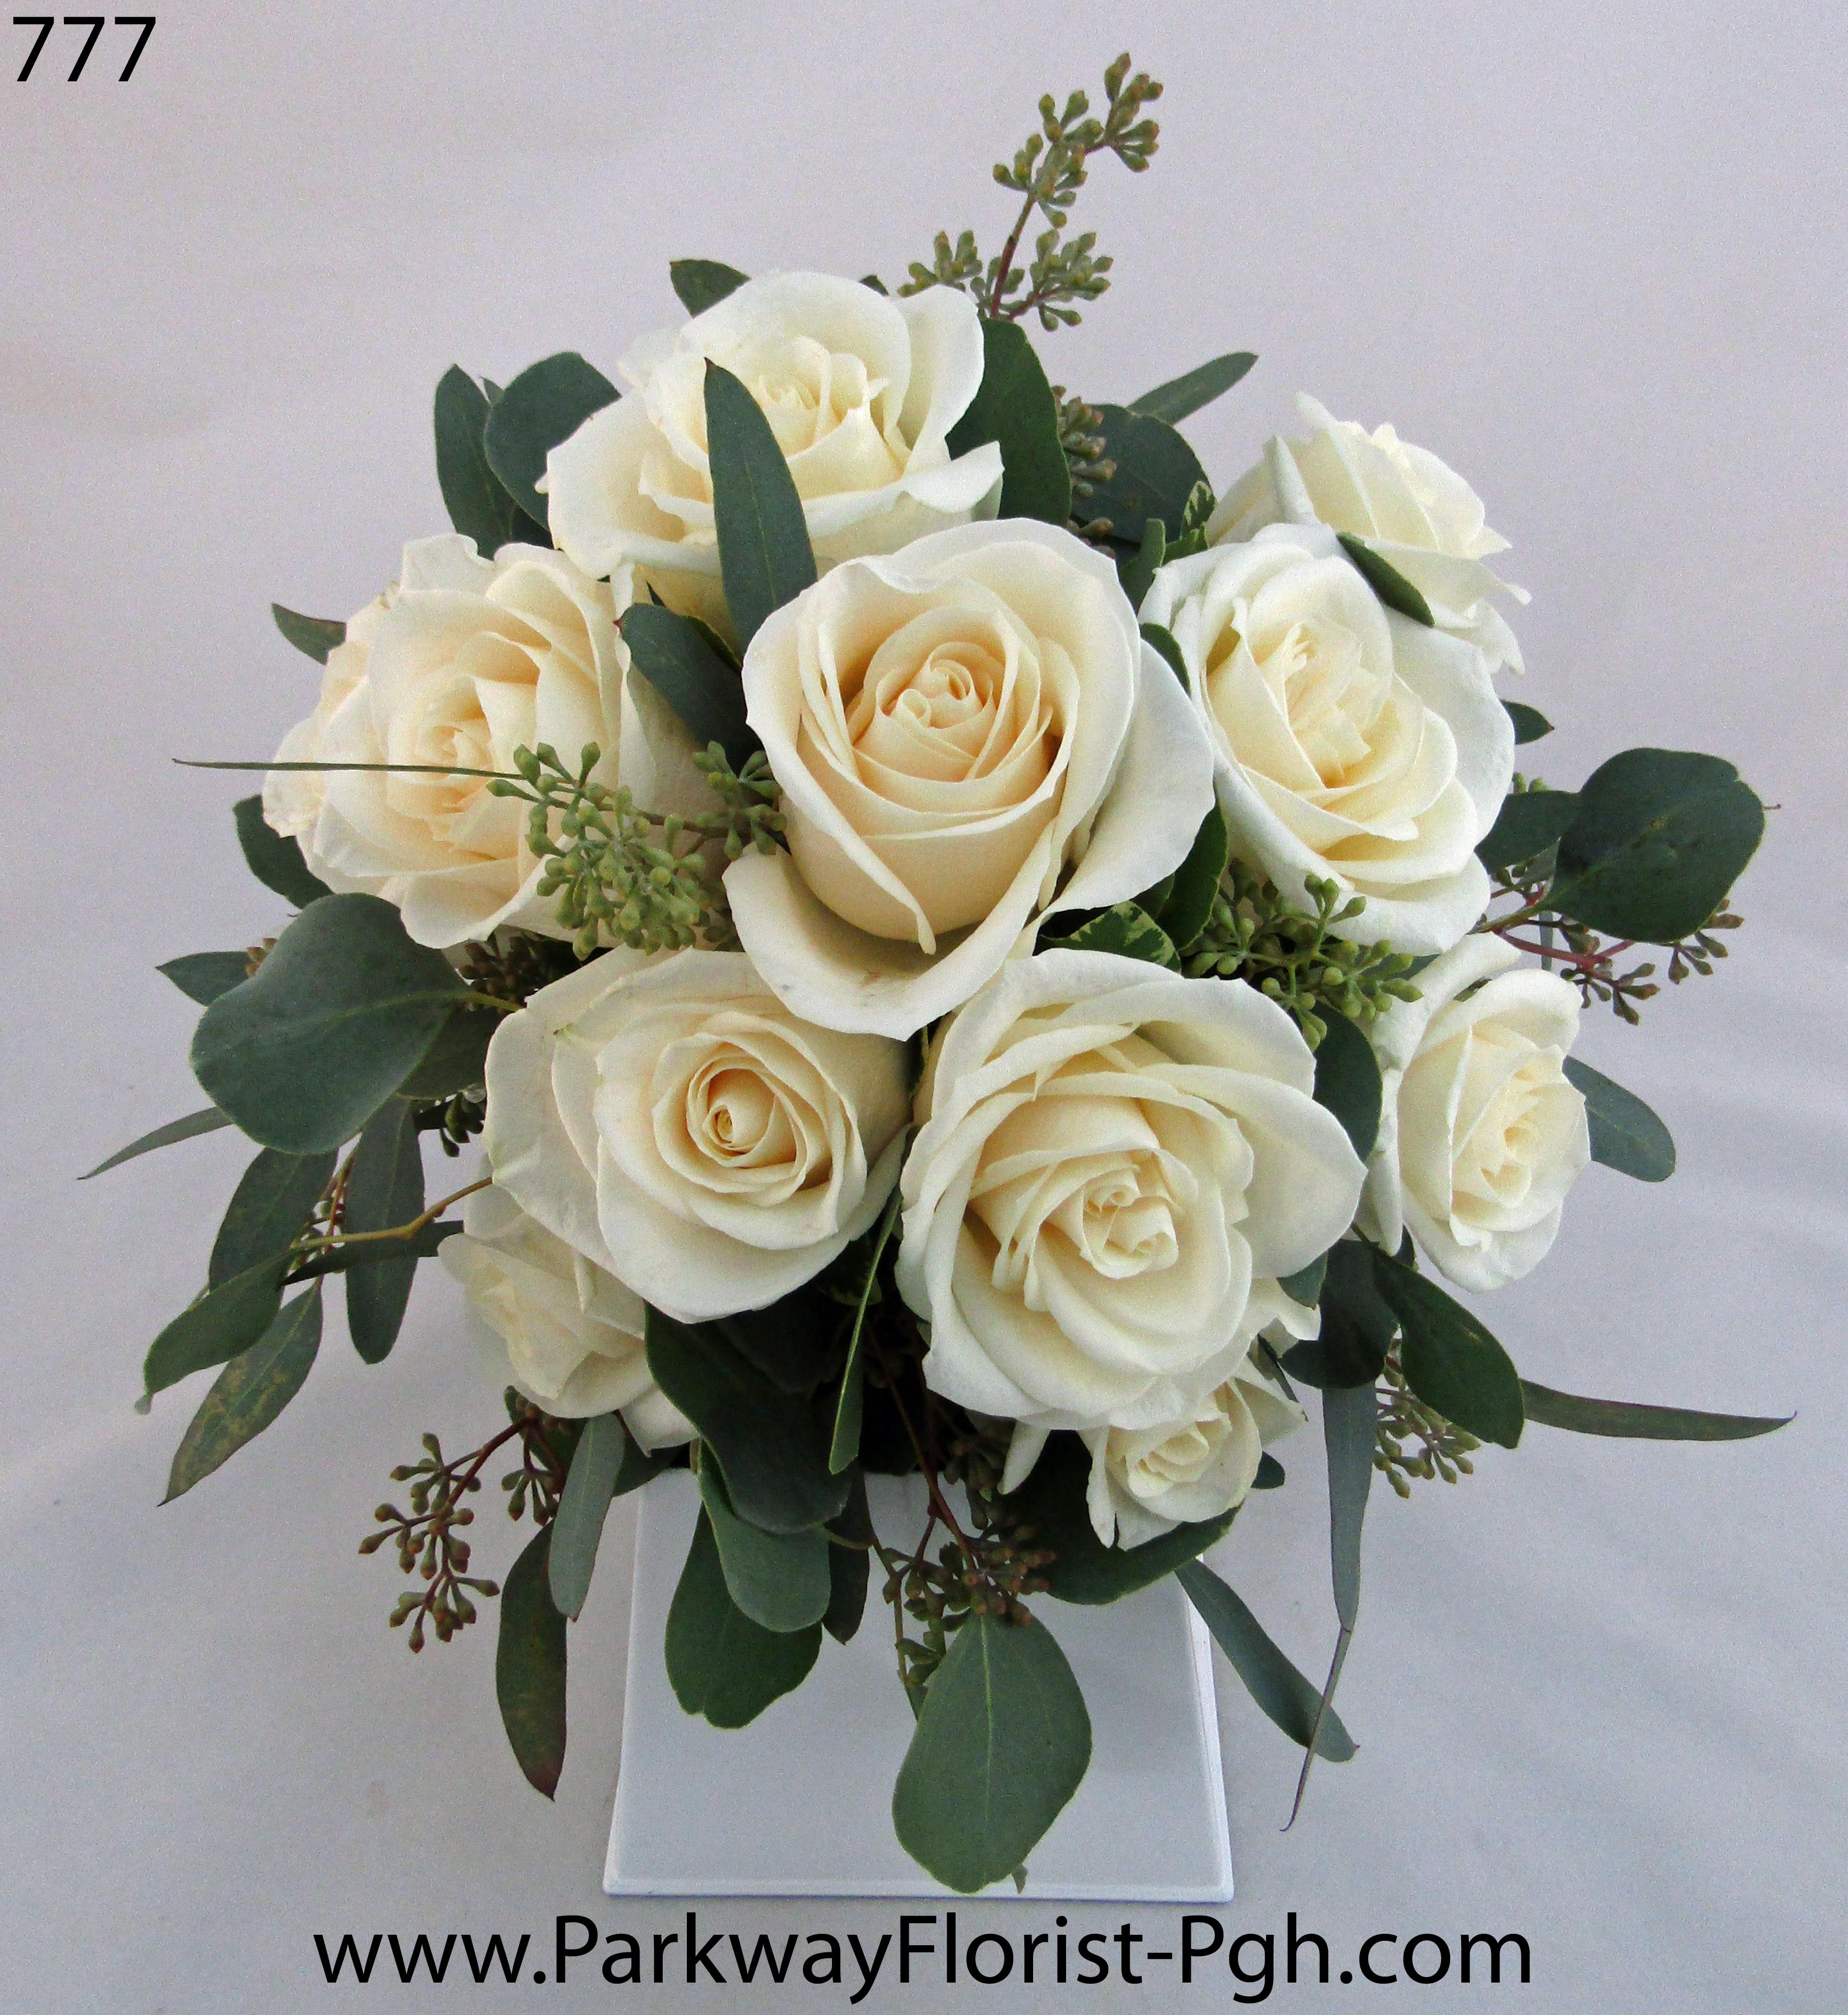 pittsburgh wedding flowers parkway florist pittsburgh blog. Black Bedroom Furniture Sets. Home Design Ideas